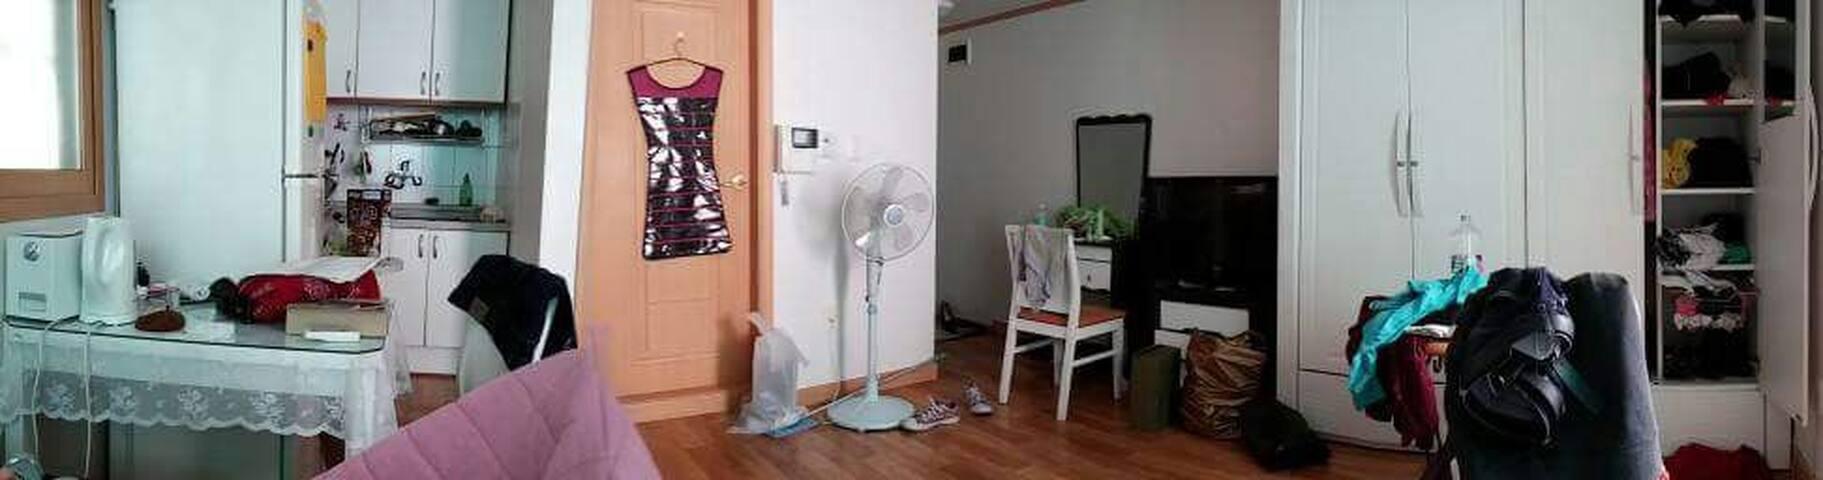 Sm apartment - 聖馬科斯(San Marcos) - 公寓